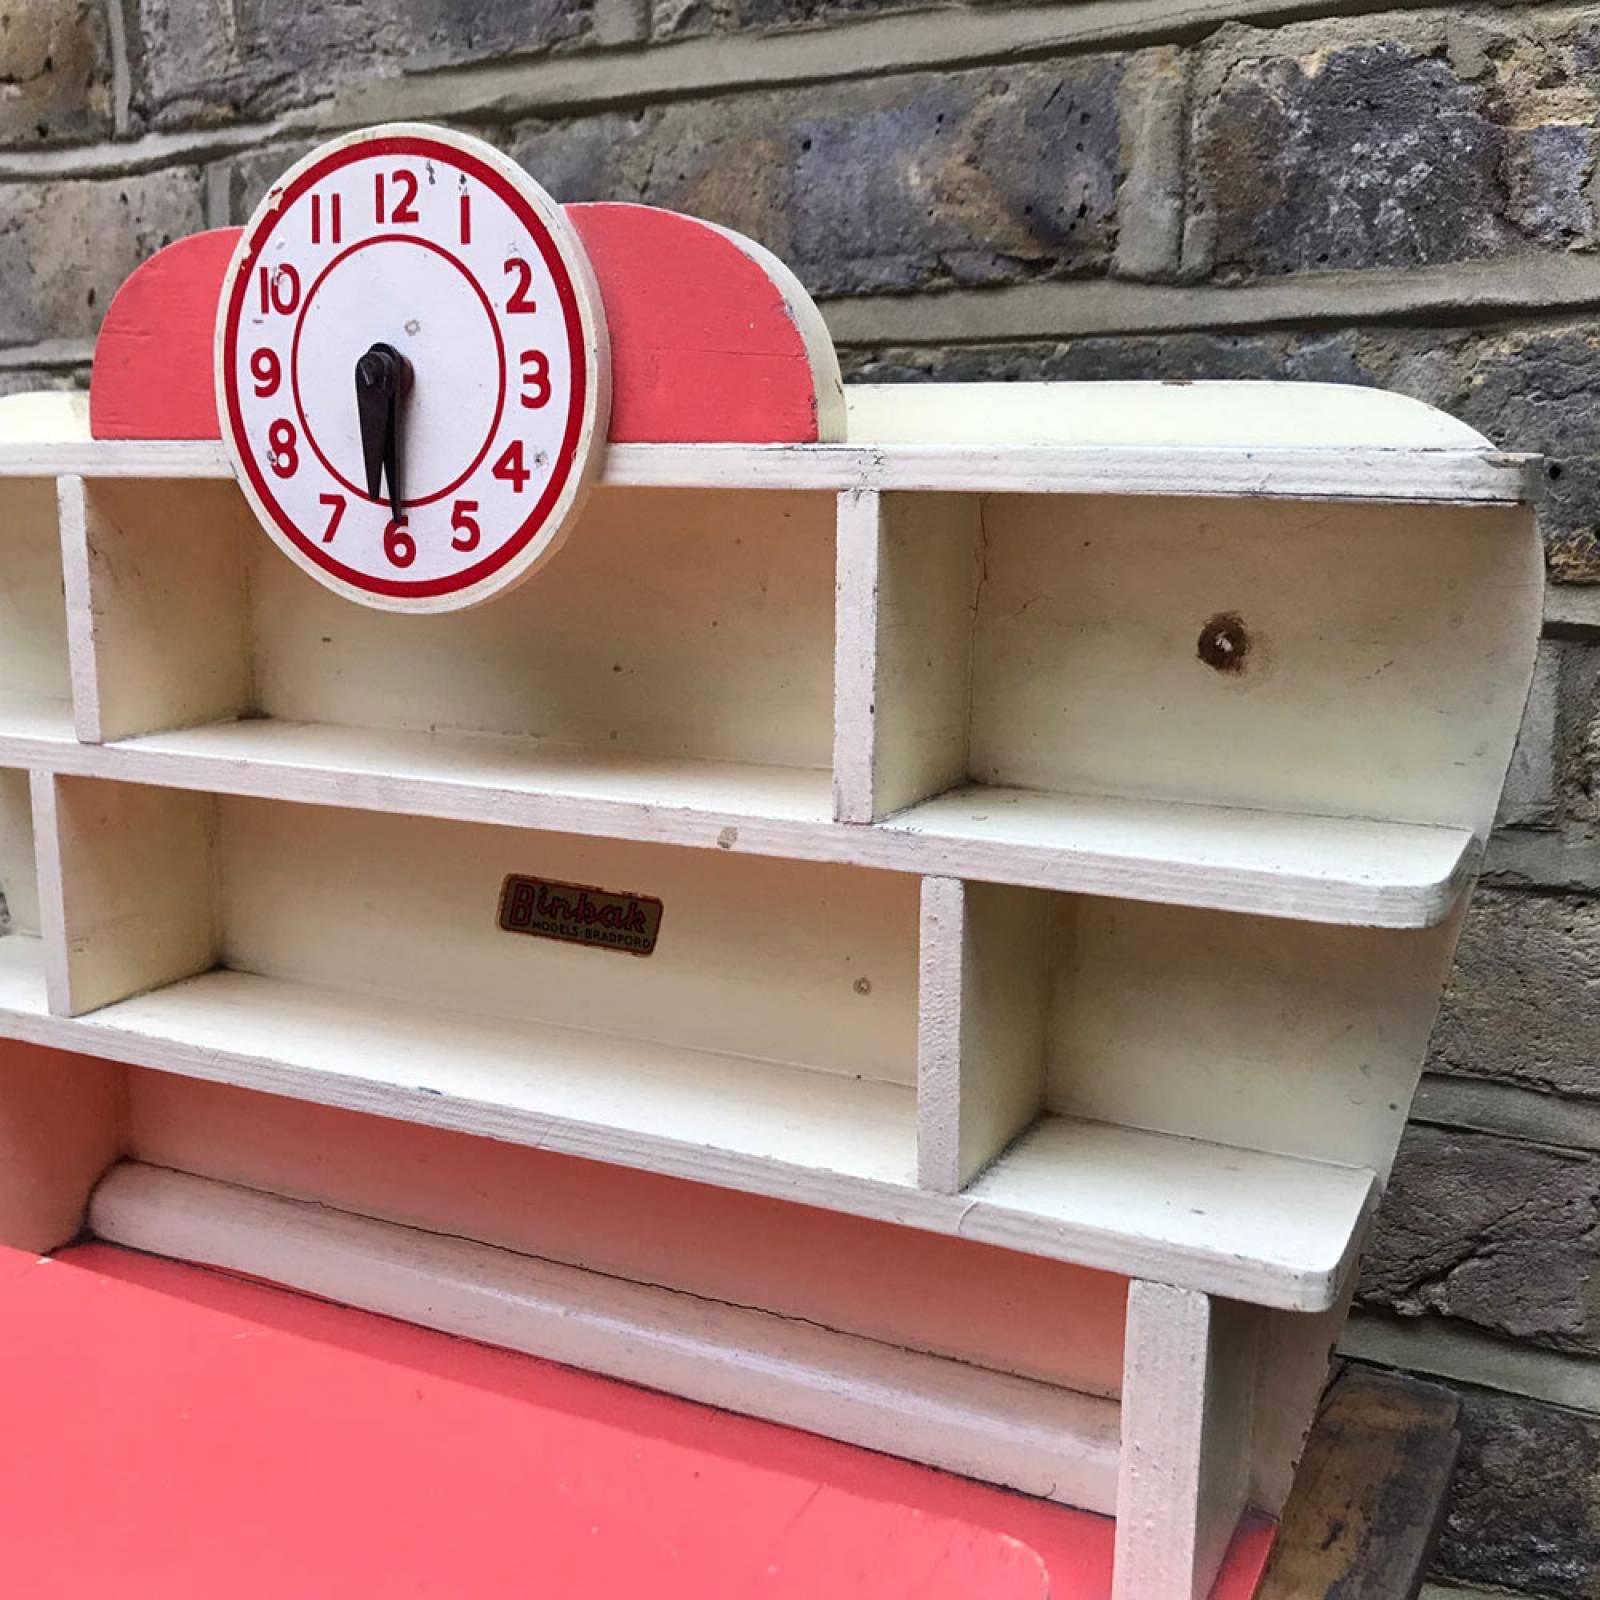 Vintage 1950s Toy Quality Shop by Binbak Models thumbnails